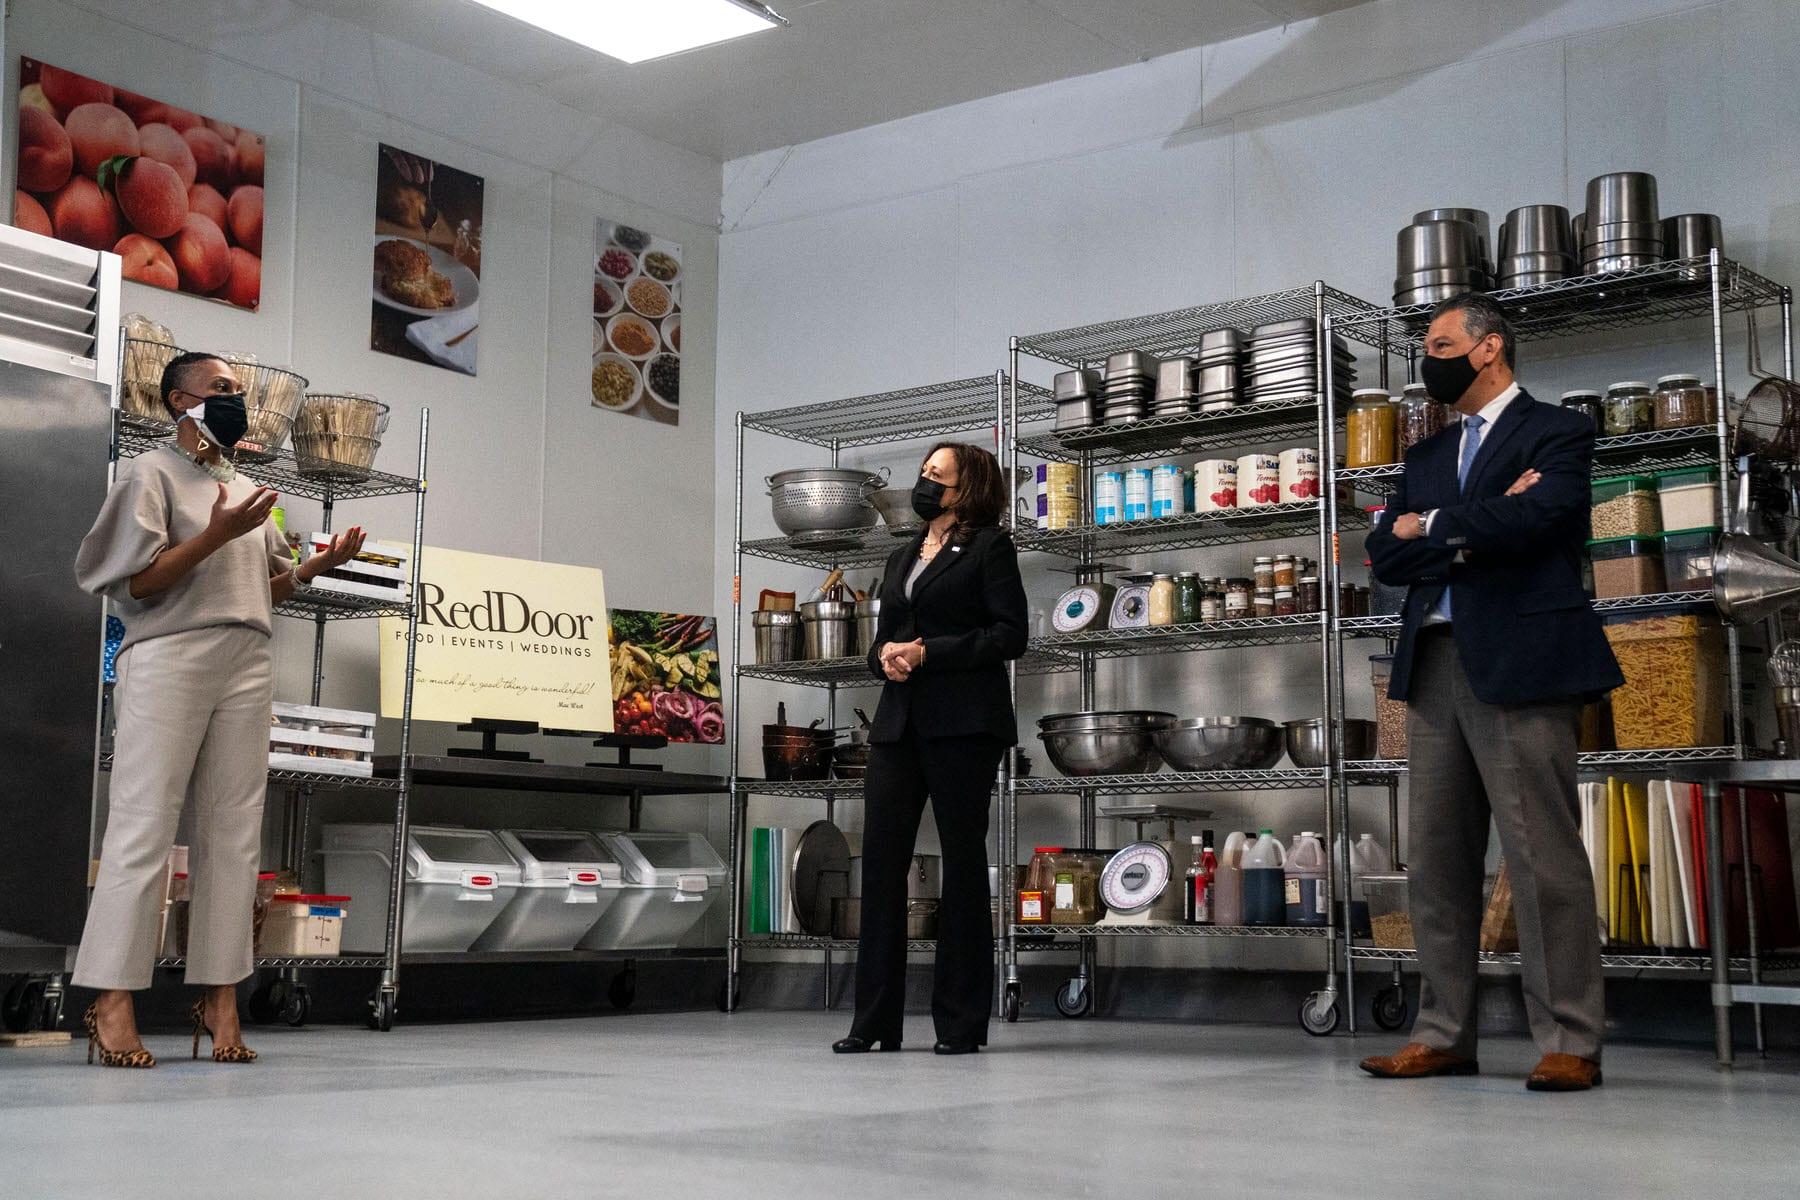 Reign Free, Owner of Red Door Catering speaks as Vice President Kamala Harris and Sen. Alex Padilla (D-CA) listen in the RedDoor kitchen.